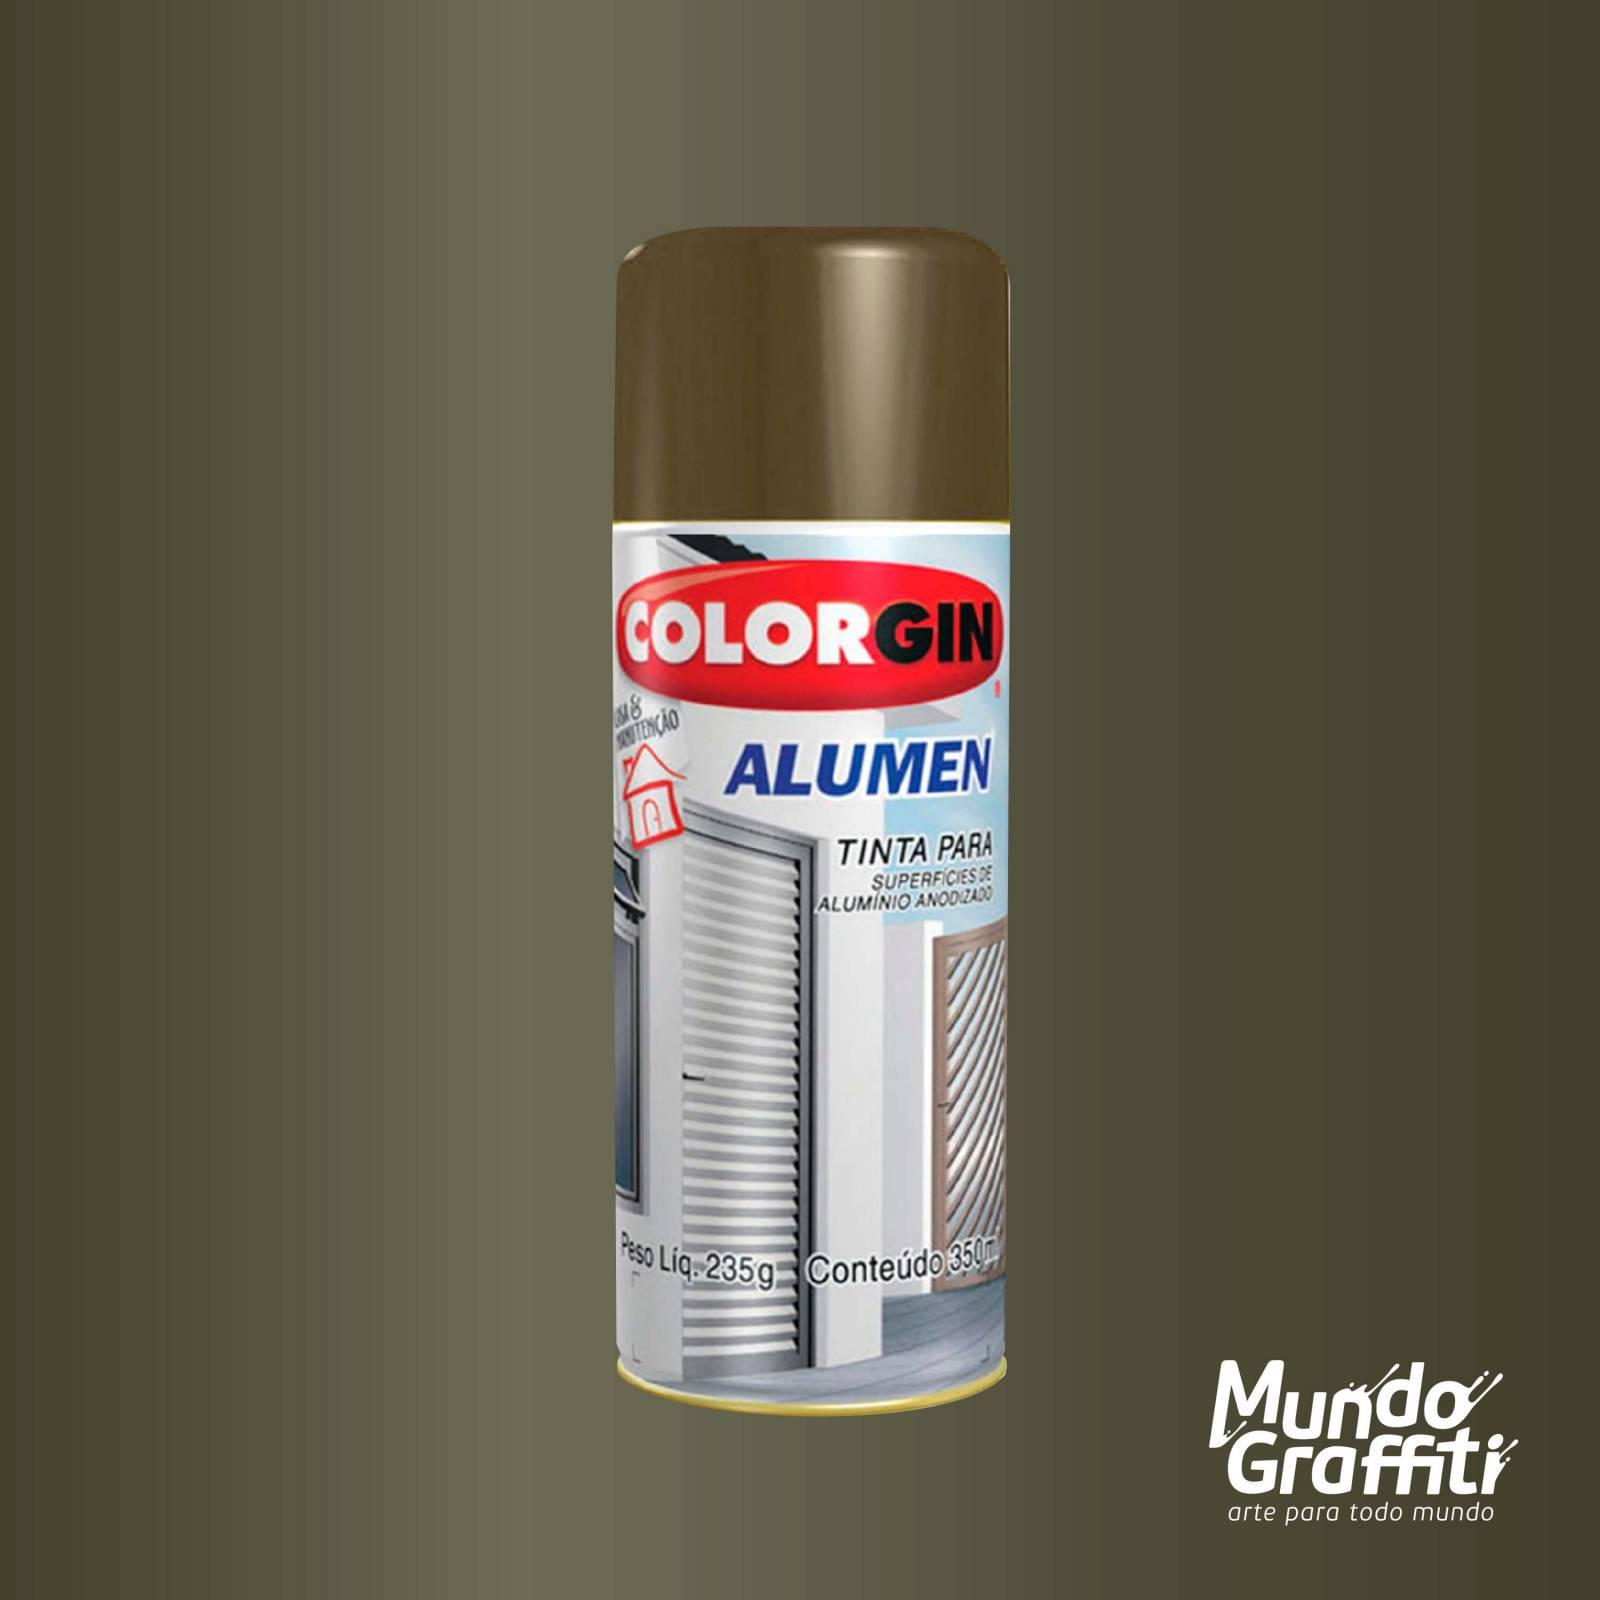 Tinta Spray Colorgin Alumen 771 Bronze Claro 350ml - Mundo Graffiti